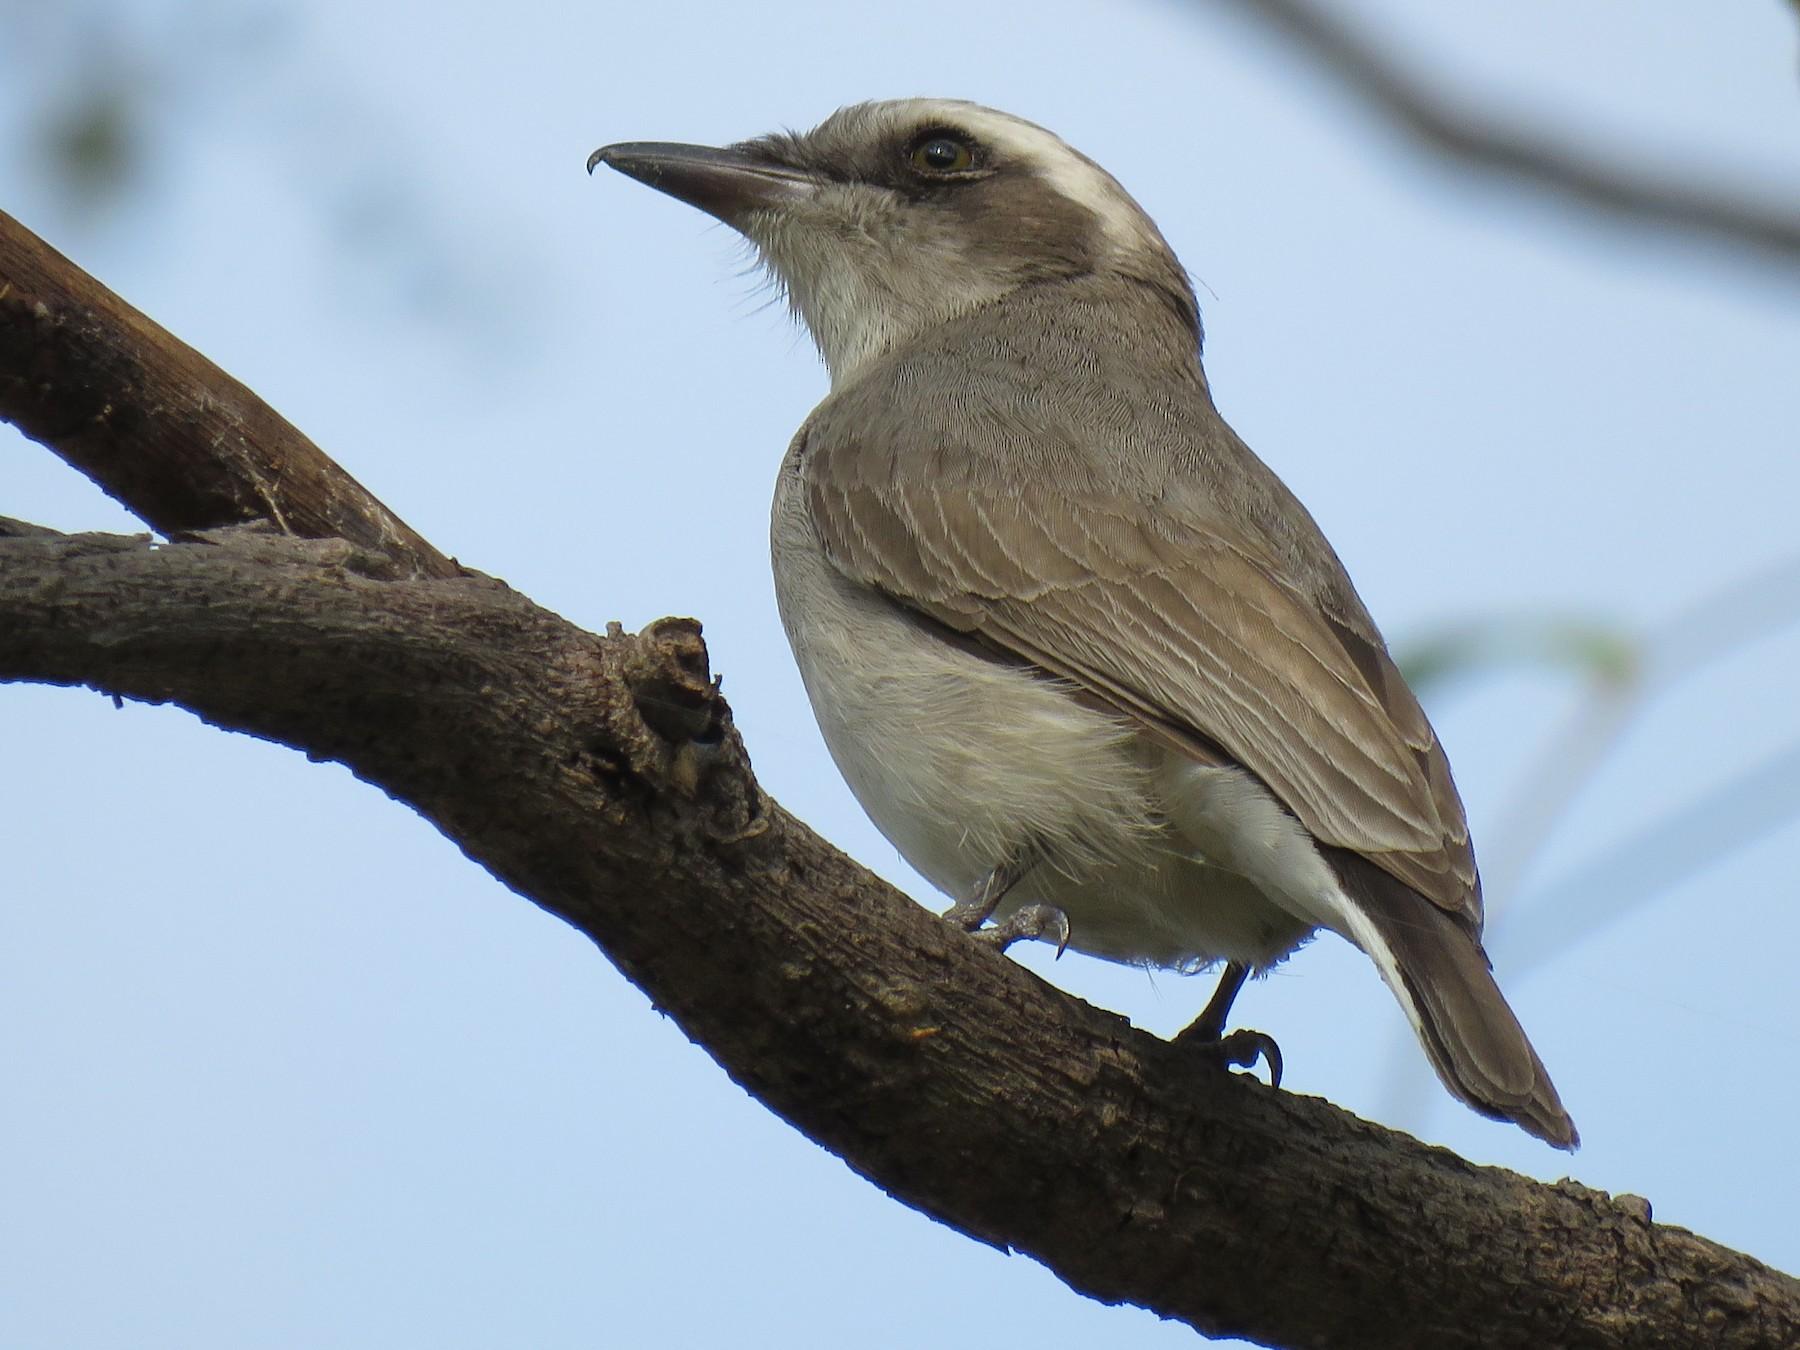 Common Woodshrike - Krishnamoorthy Muthirulan